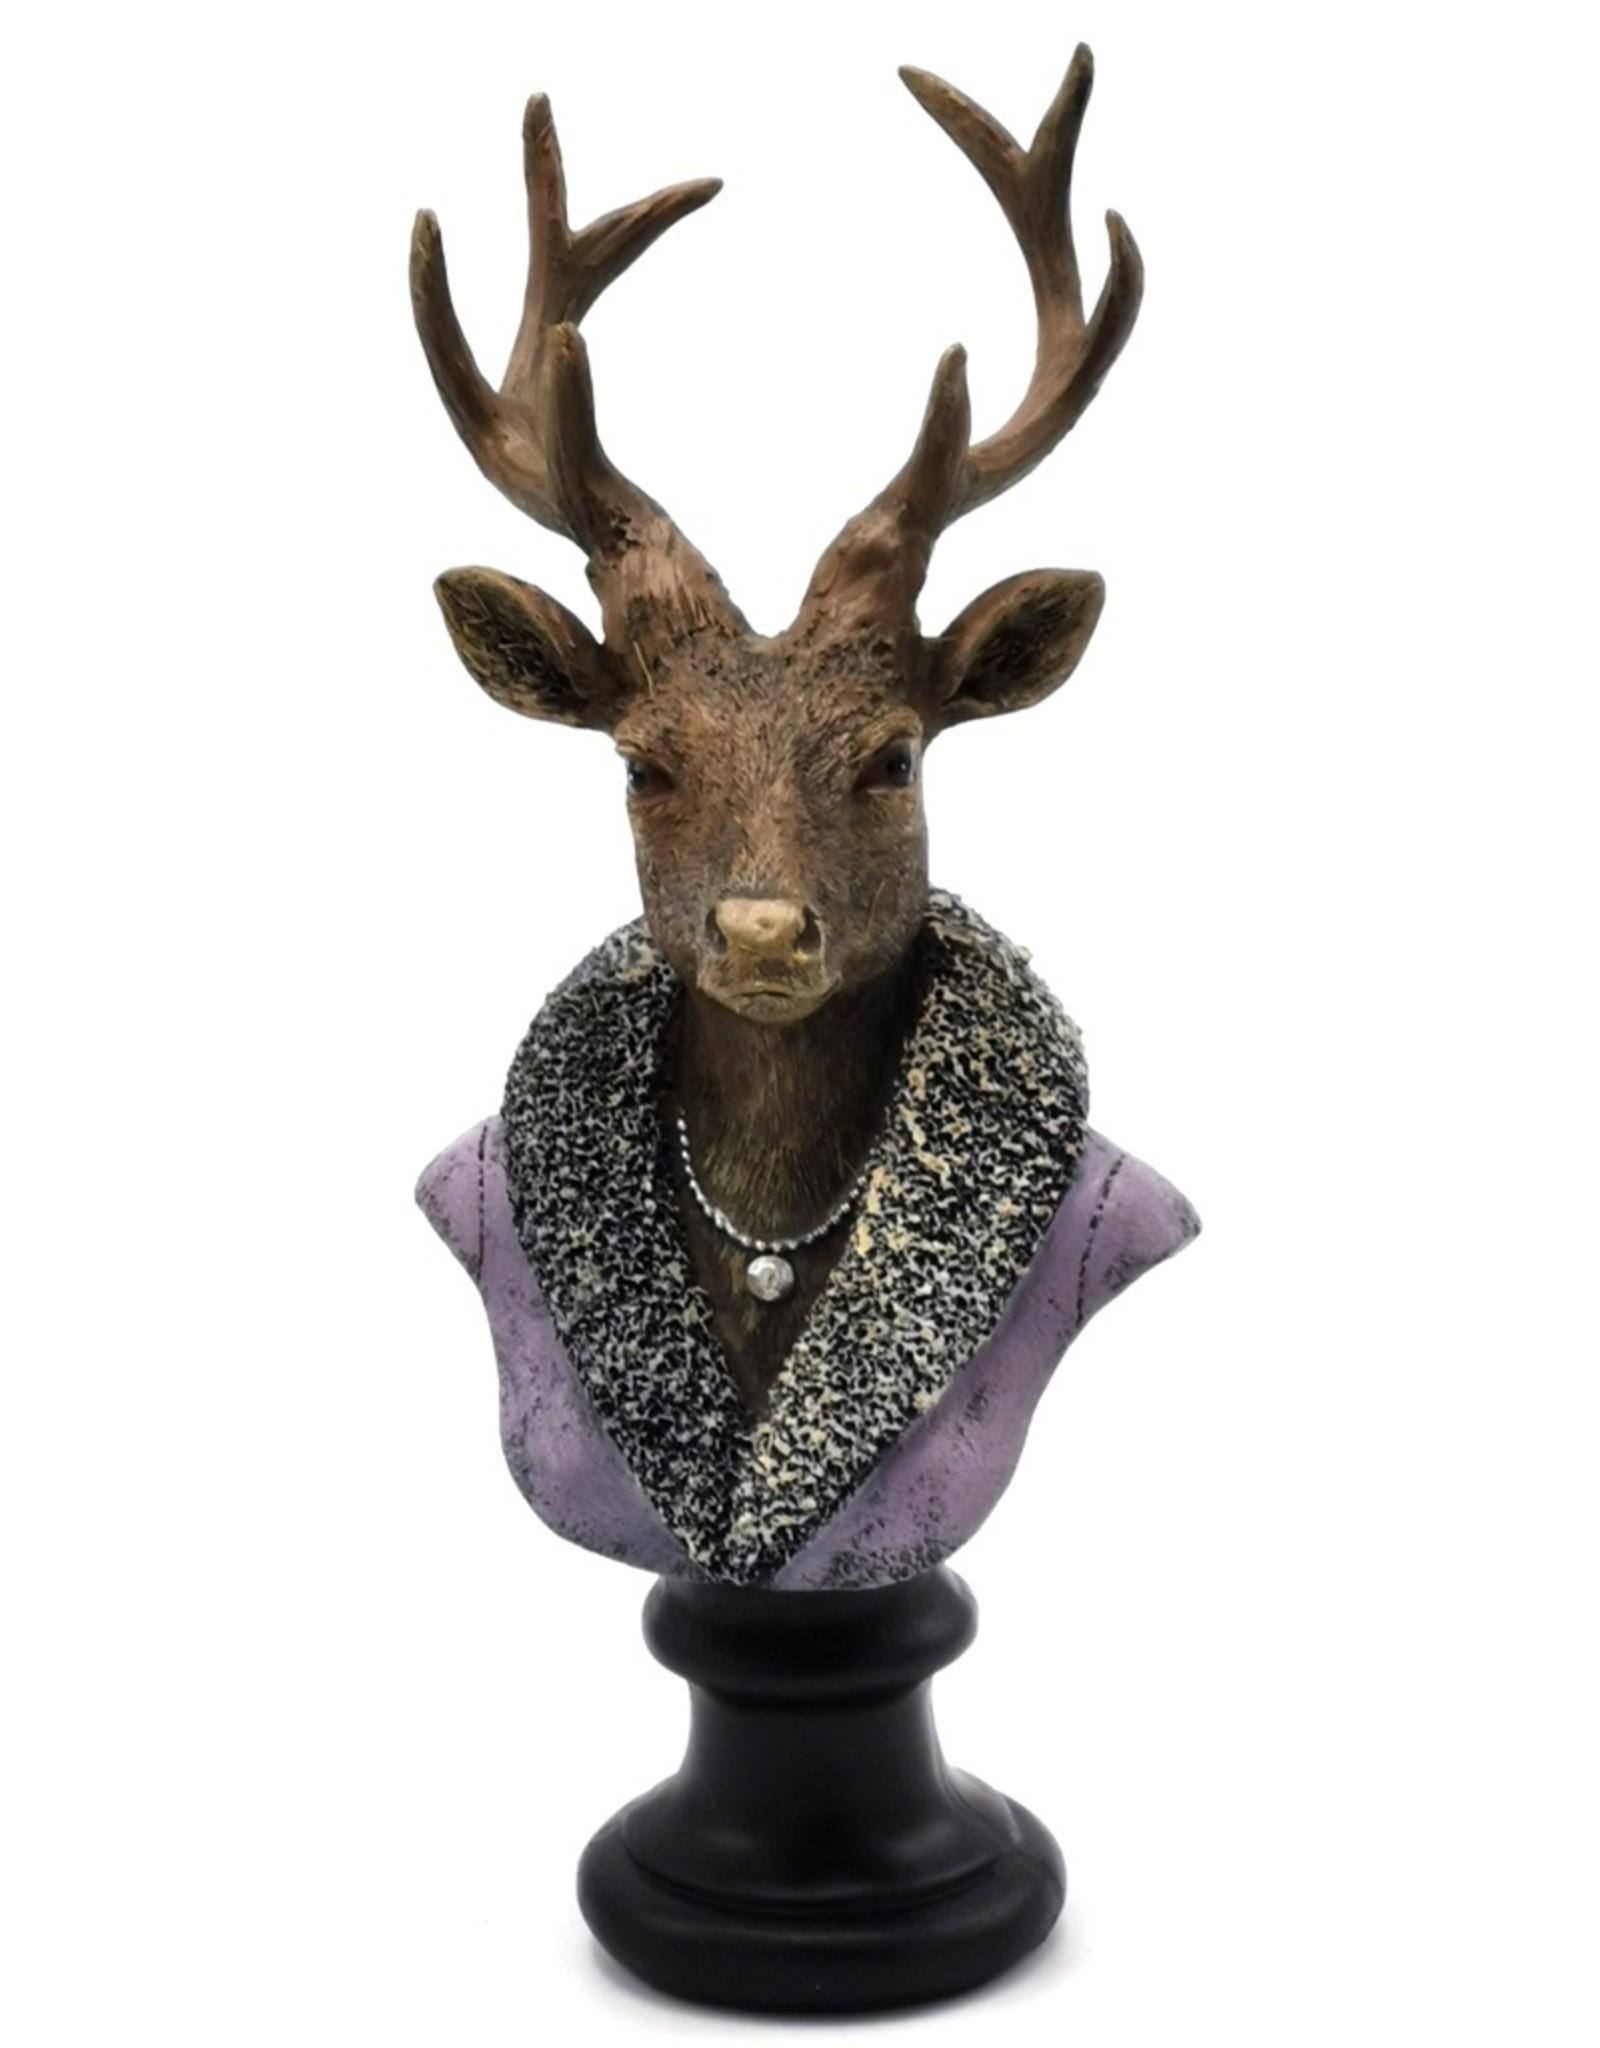 C&E Giftware & Lifestyle - Hert Buste gekleed als Dame 21cm